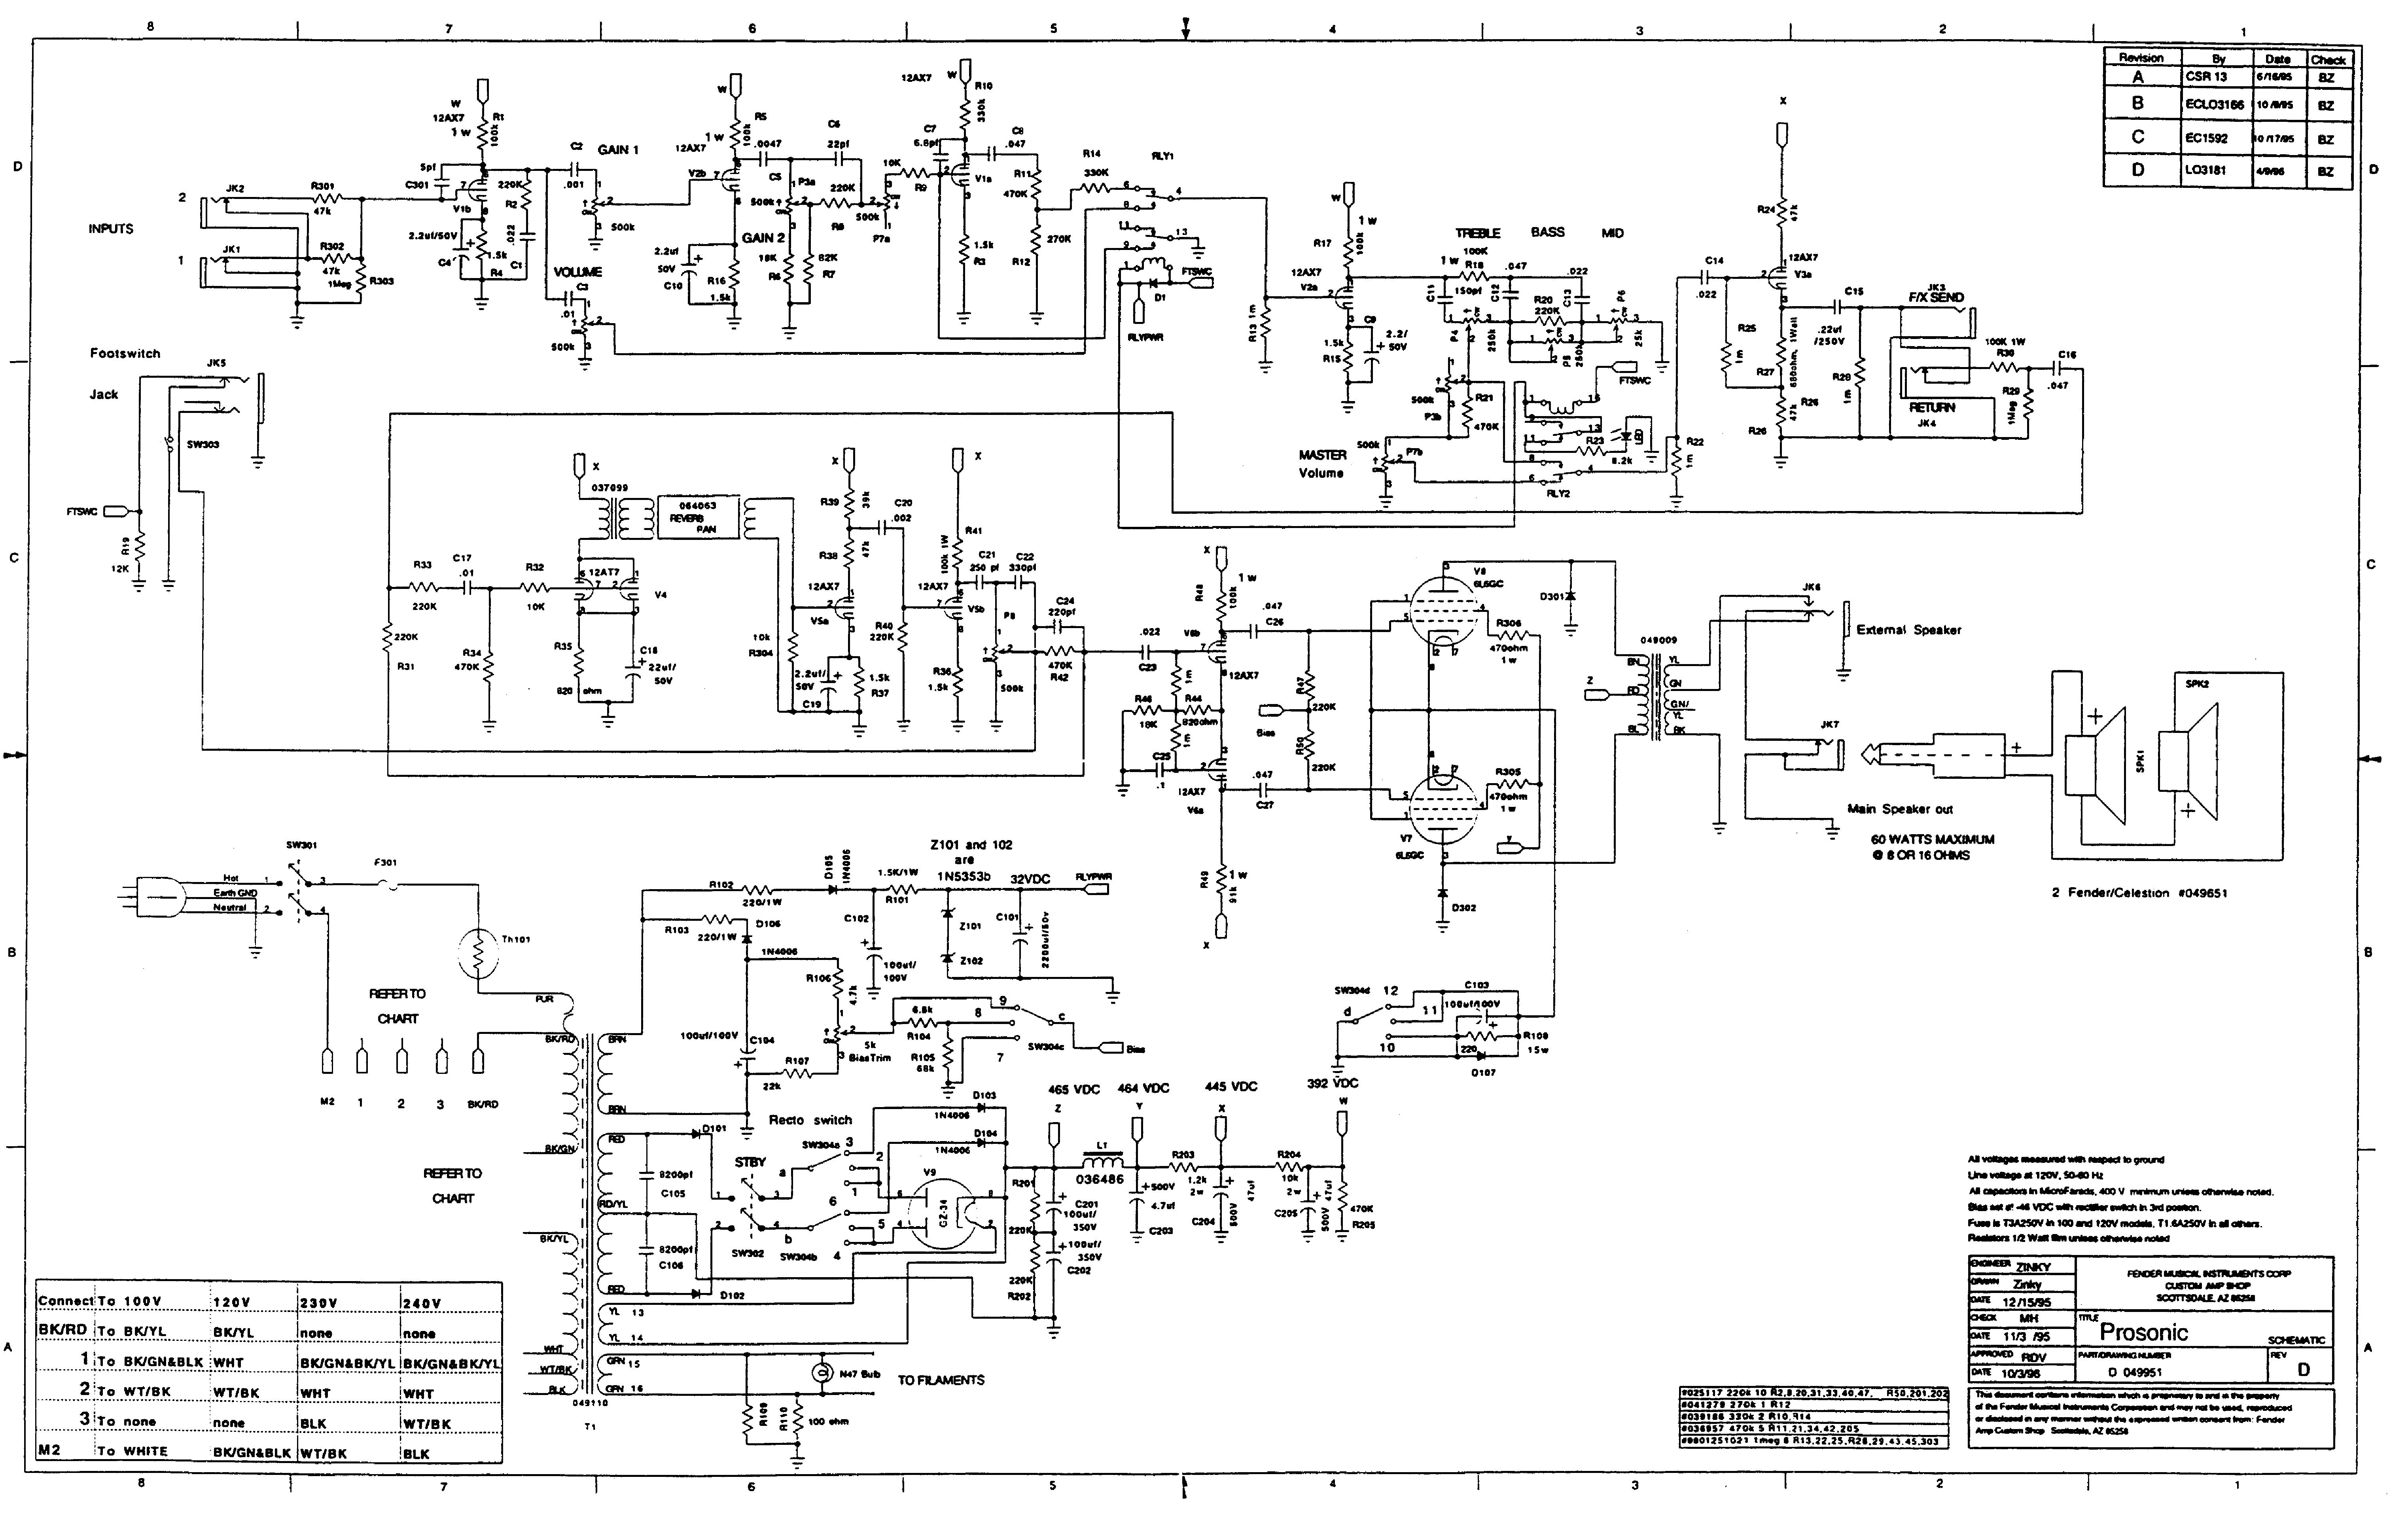 FENDER PROSONIC REV.D SCH Service Manual download, schematics ... on fender vibrolux, peavey classic 50 schematic, fender twin amp, deluxe reverb layout schematic, fender deluxe reverb, fender amp schematics, peavey valveking schematic, fender prosonic tubes, fender prosonic head, fender bandmaster tubes, fender tone master, marshall 1959 schematic, marshall bluesbreaker schematic,